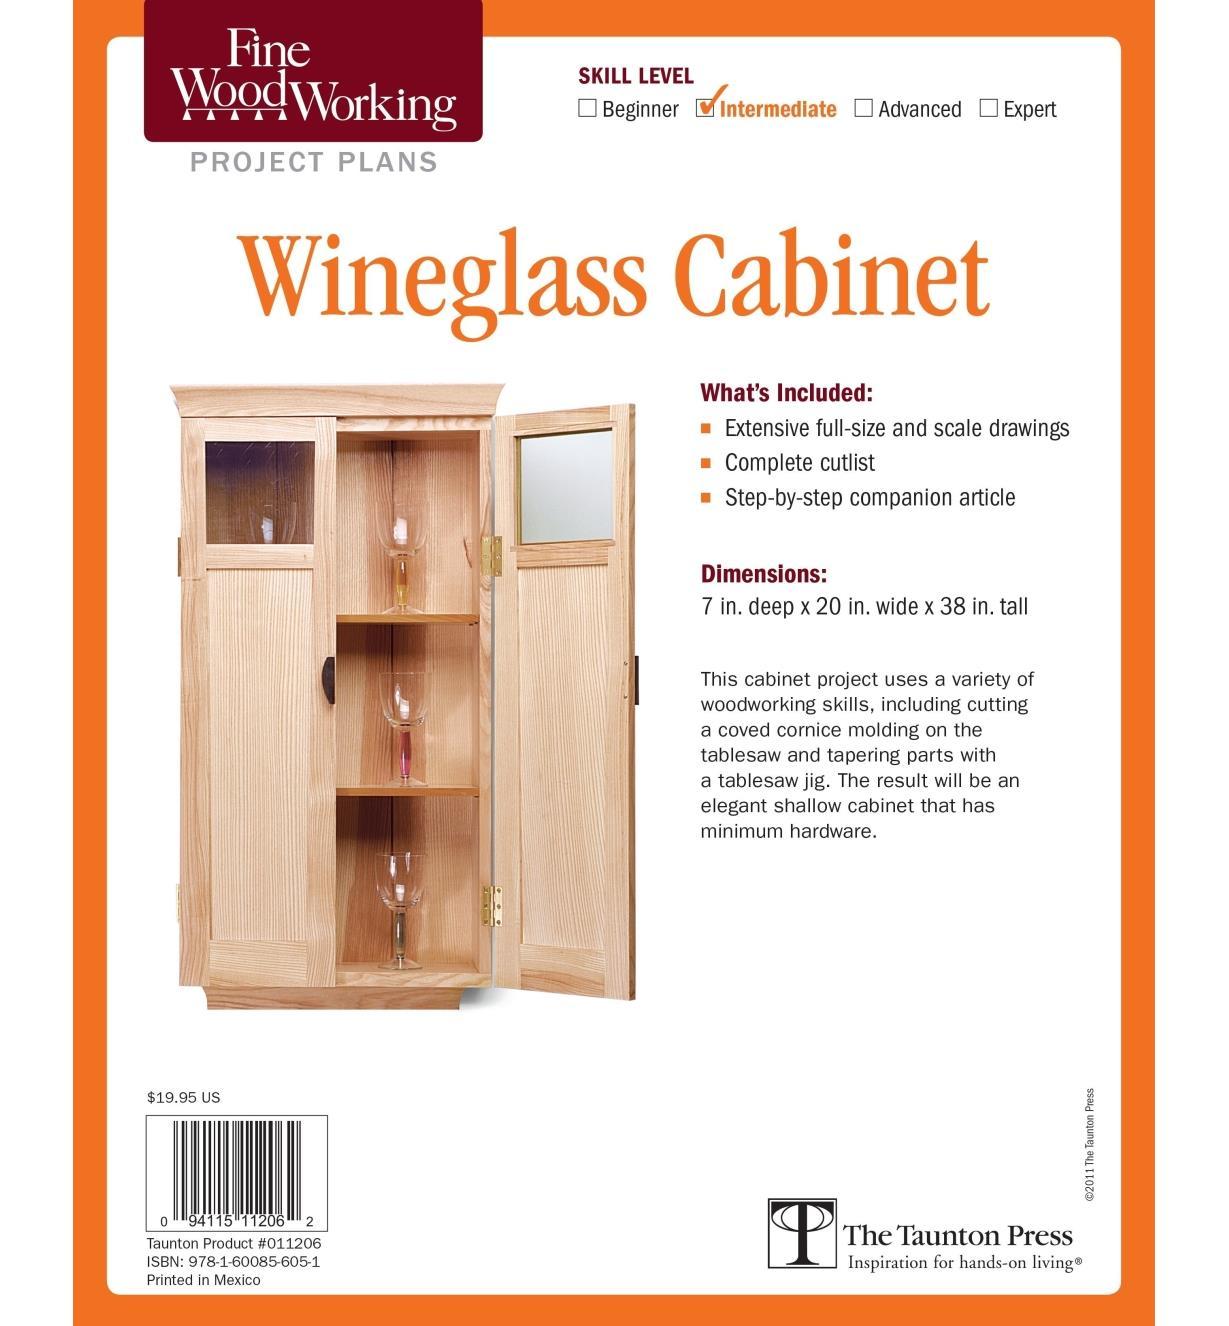 73L2543 - Wineglass Cabinet Plan